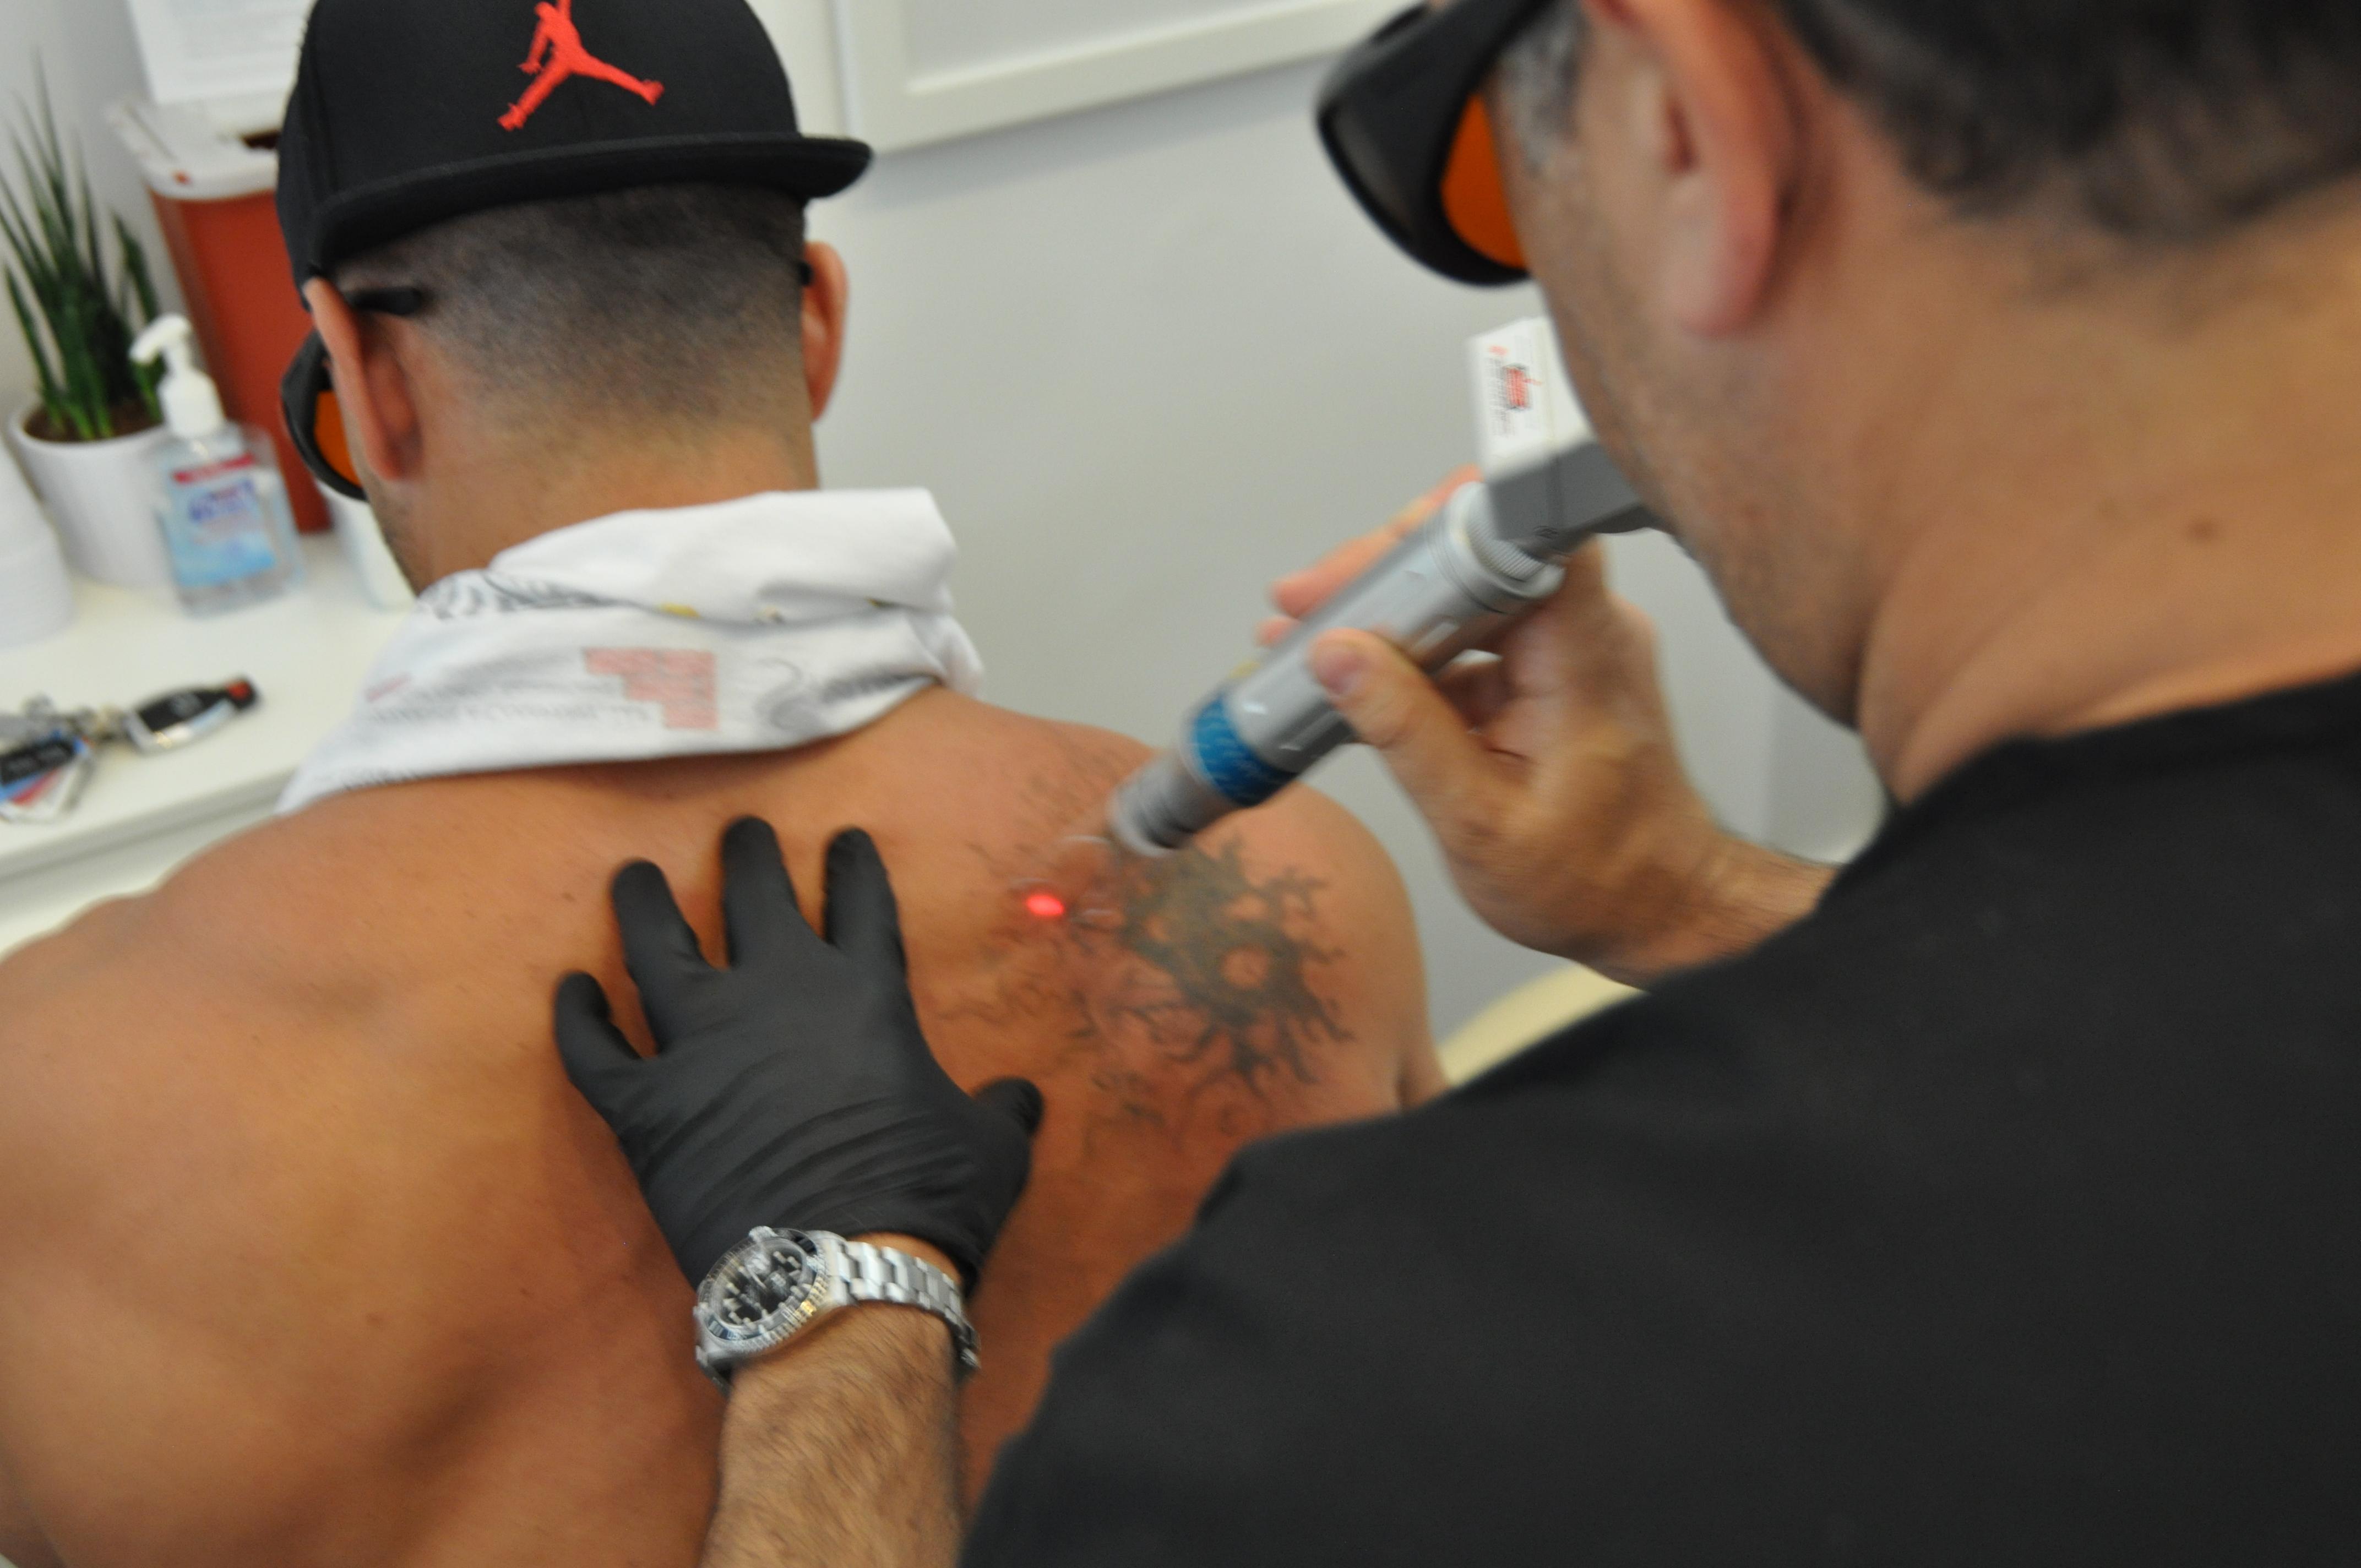 ReversaTatt Tattoo Removal